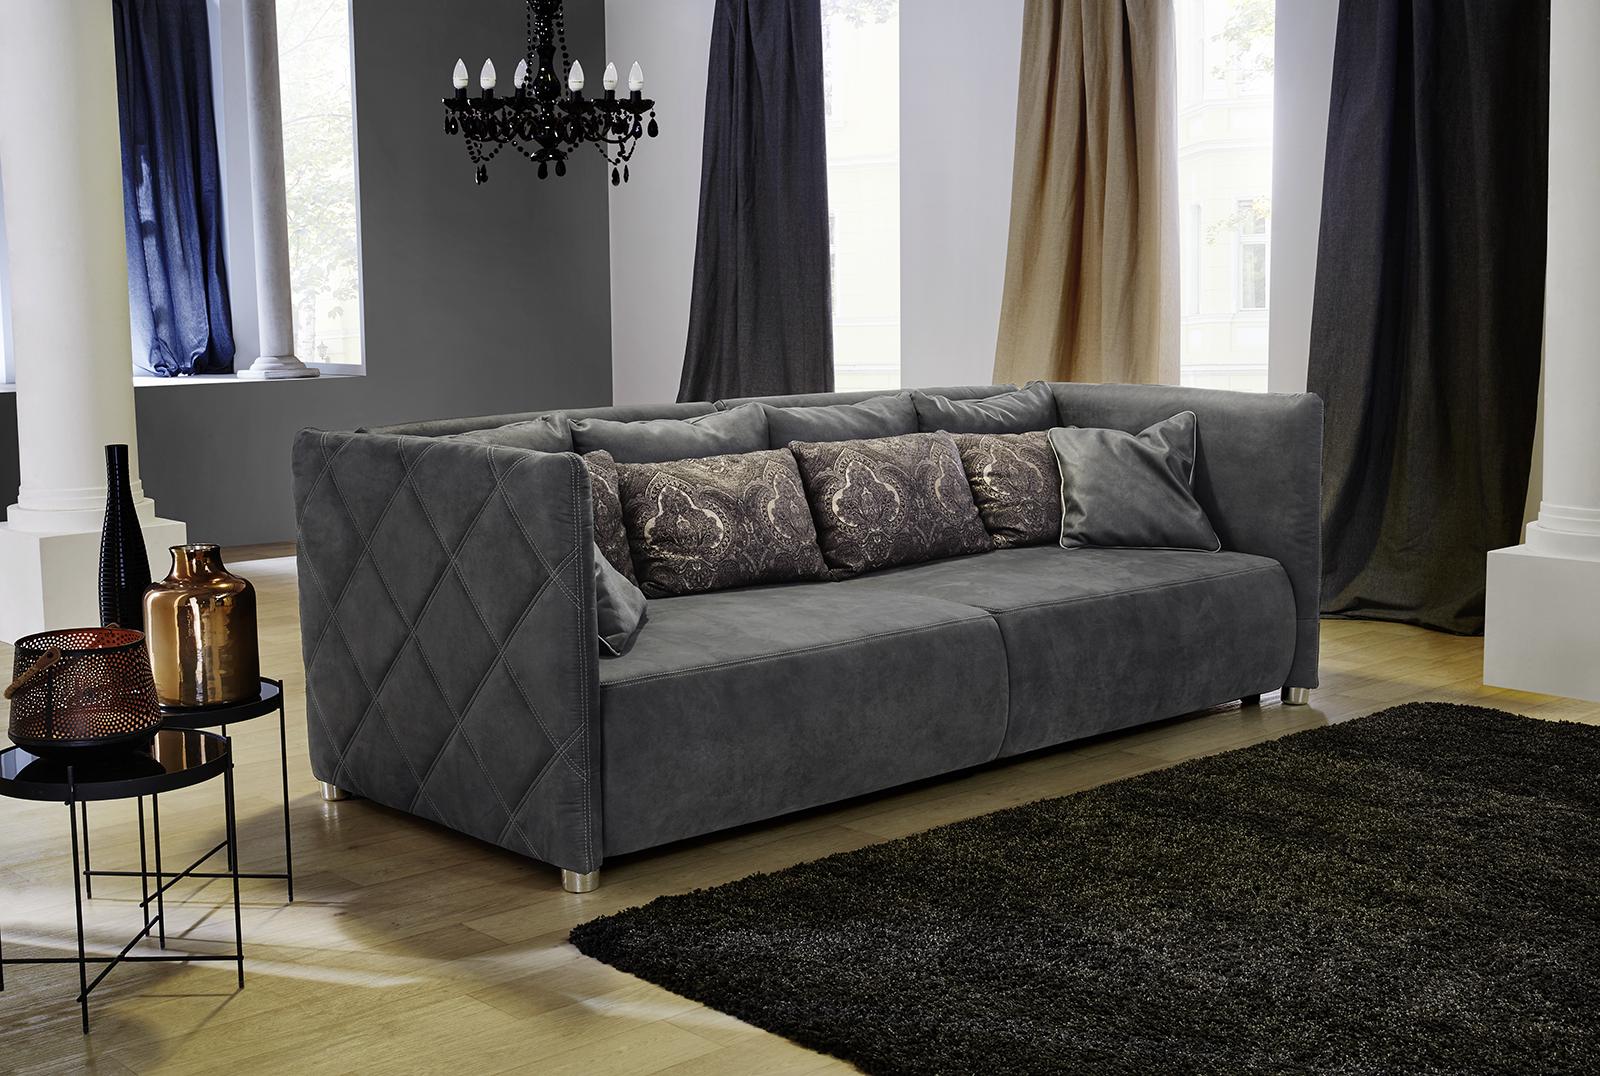 Big Sofa Treviso Kl Grau